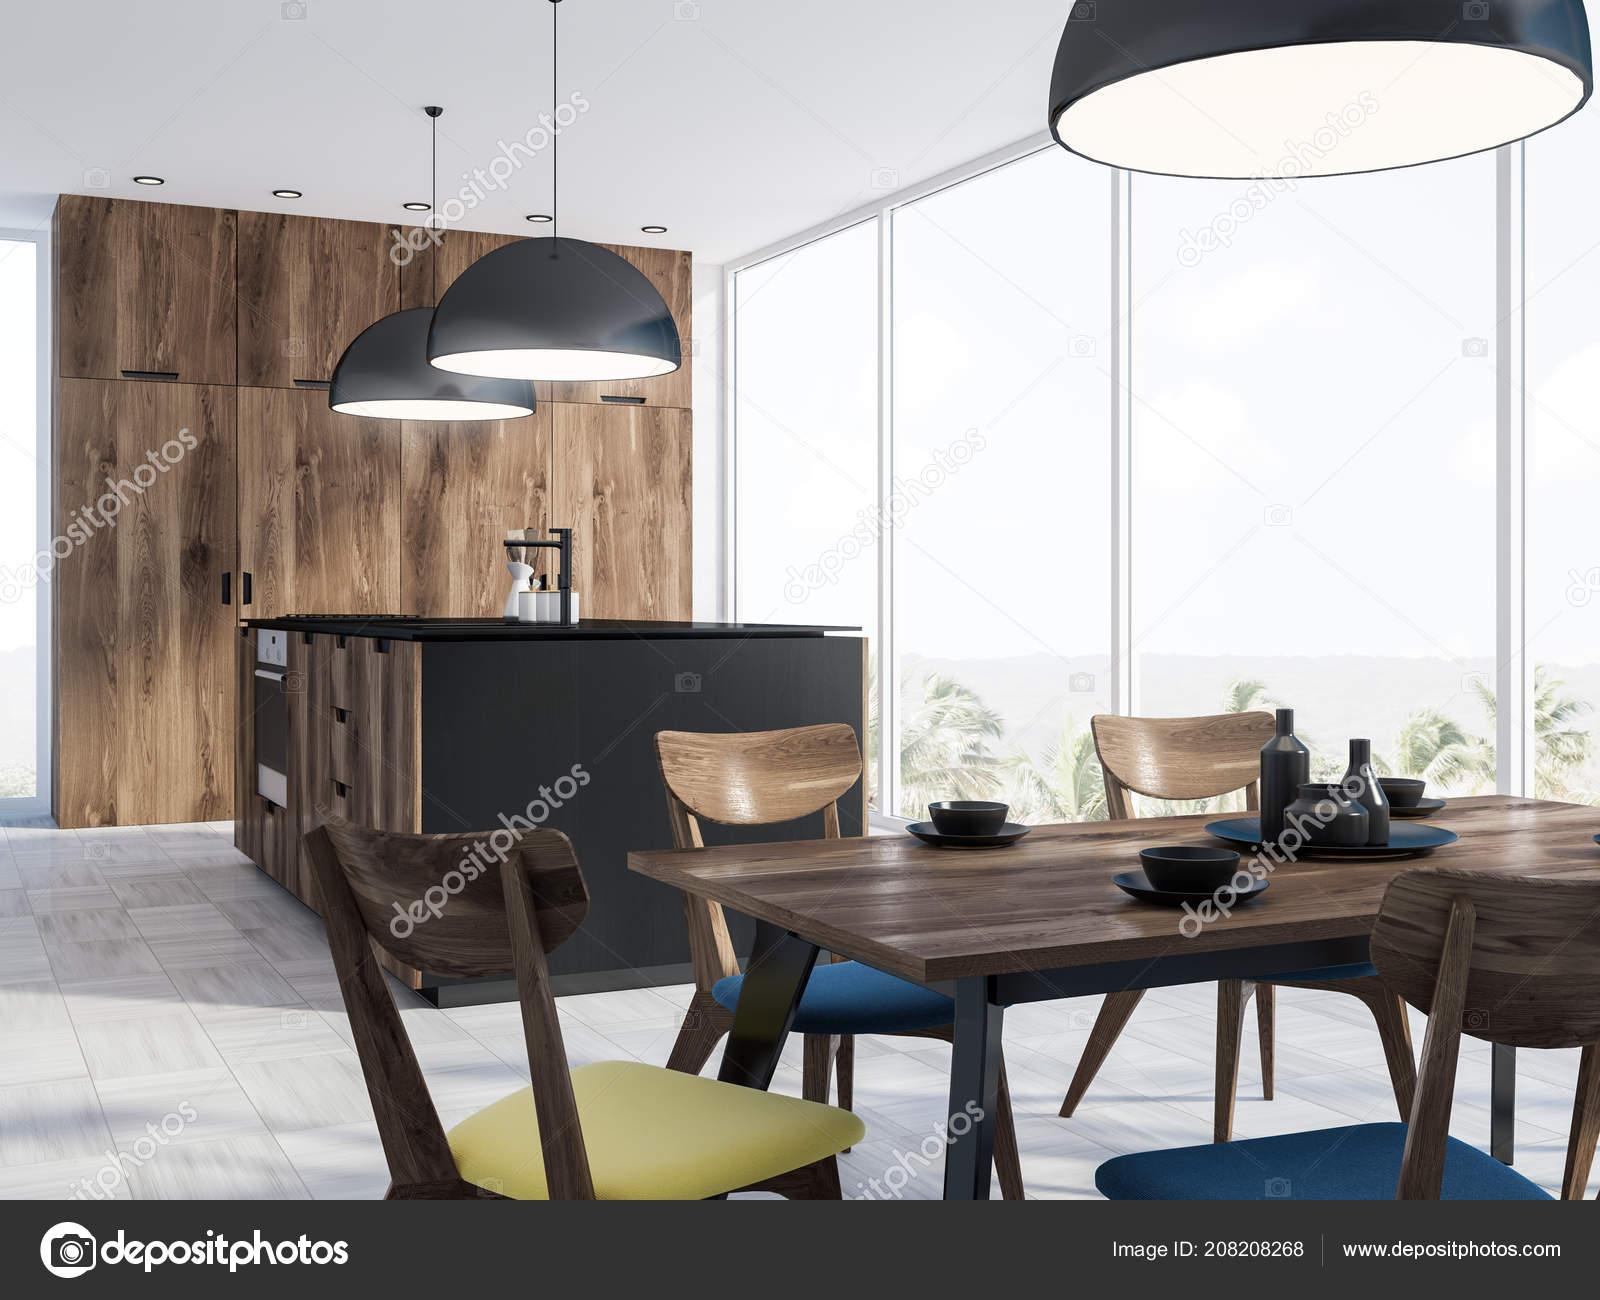 kitchen ceiling lights appliance bundles 全景厨房内部有一个混凝土地板一张桌子木制和黑色的柜台和黑色的天花板灯 全景厨房内部有一个混凝土地板 一张桌子 椅子 木制和黑色的柜台和黑色的天花板灯 3d 渲染 照片作者denisismagilov